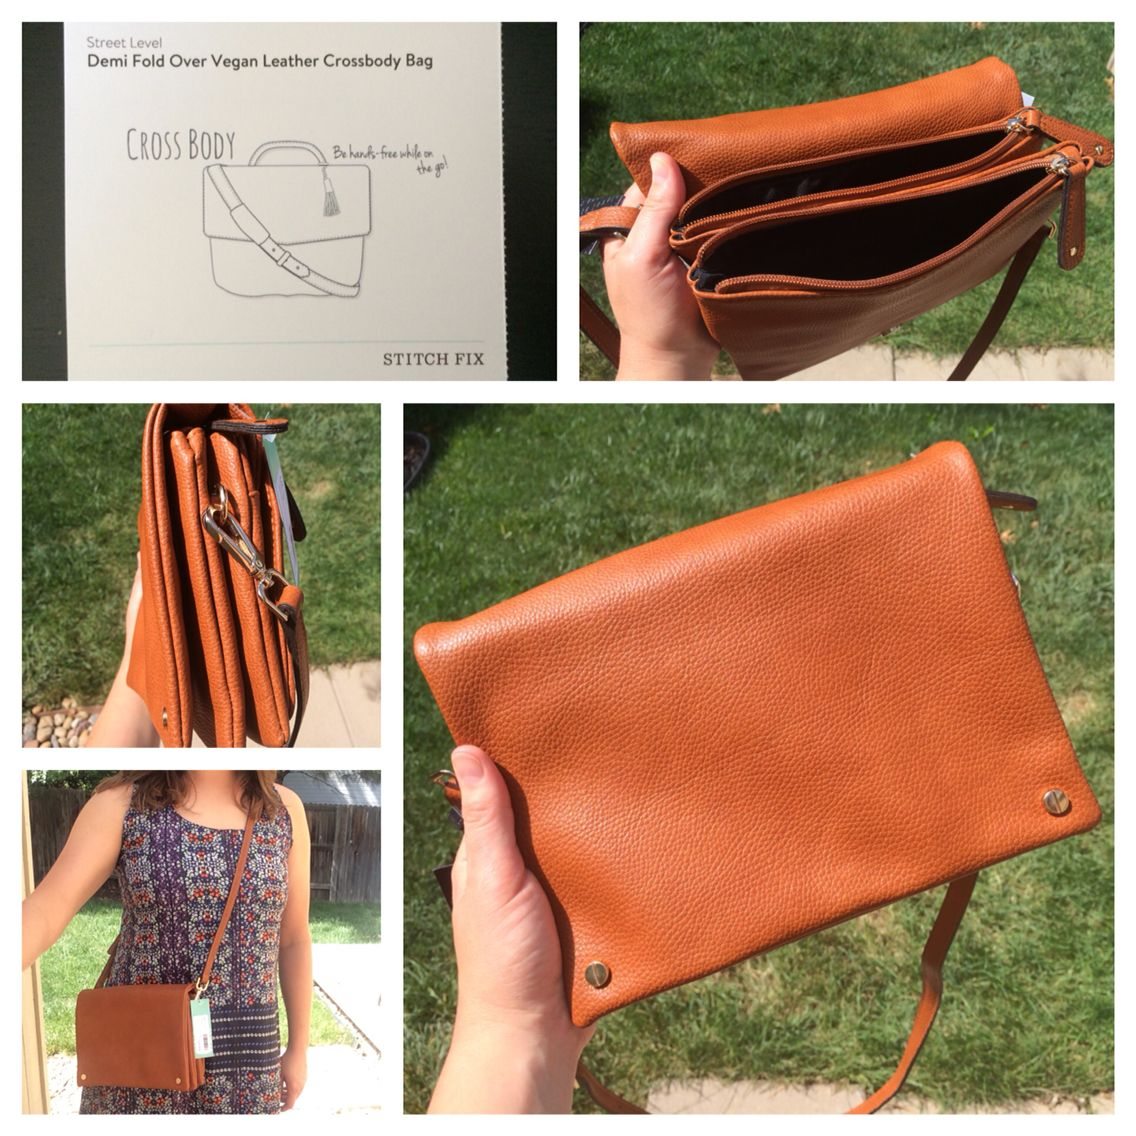 Stitch Fix 5 Alright Box Street Level Demi Fold Over Vegan Leather Crossbody Bag 48 A Crossbody Bag Is Totally My Stitch Fix Bags Foldover Crossbody Bag